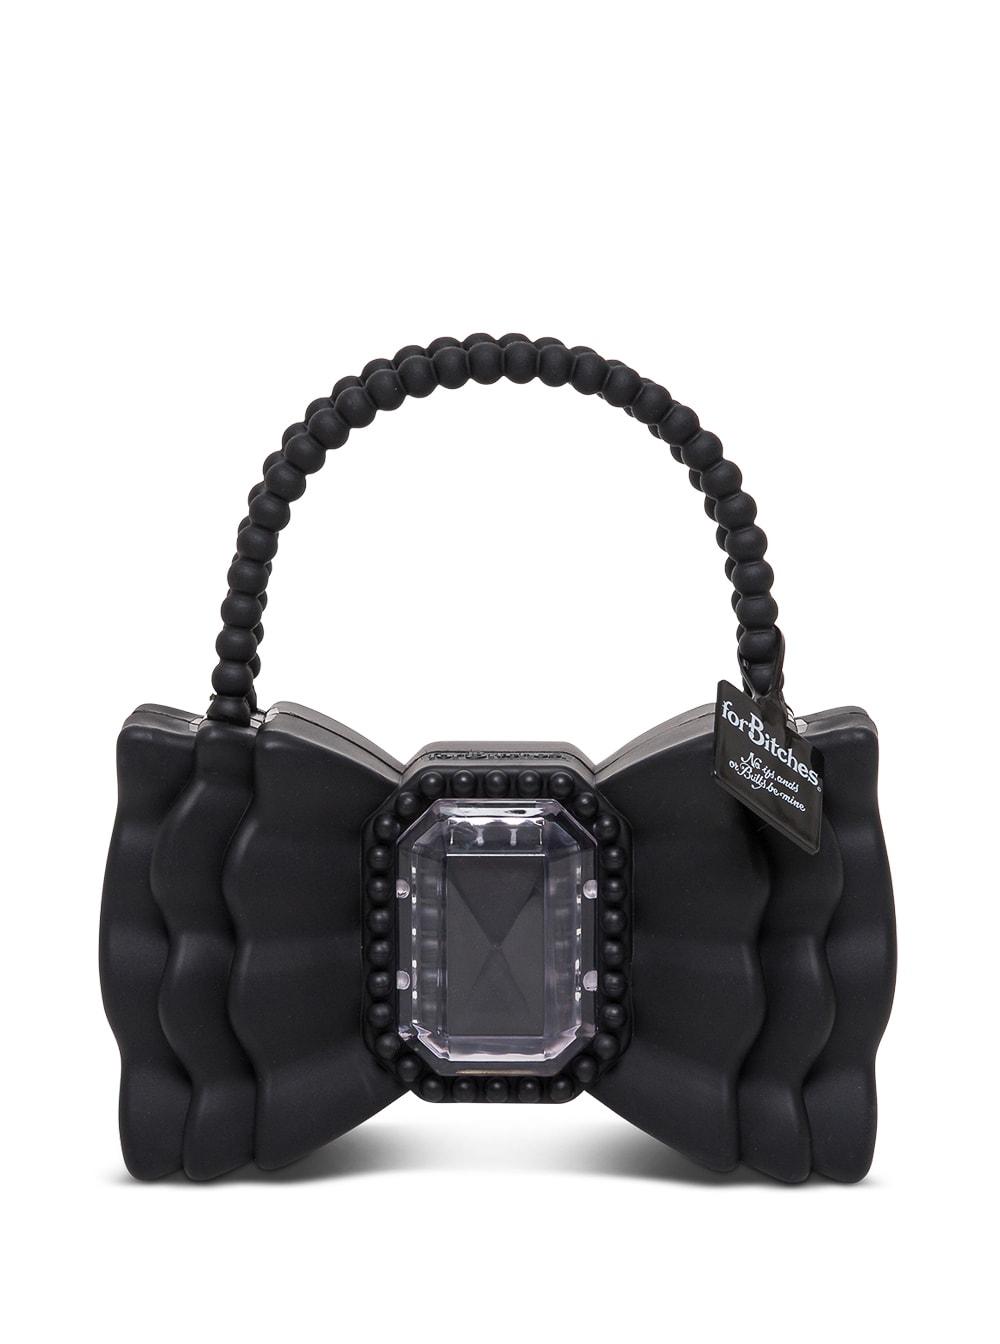 Peewee Bow Black Handbag